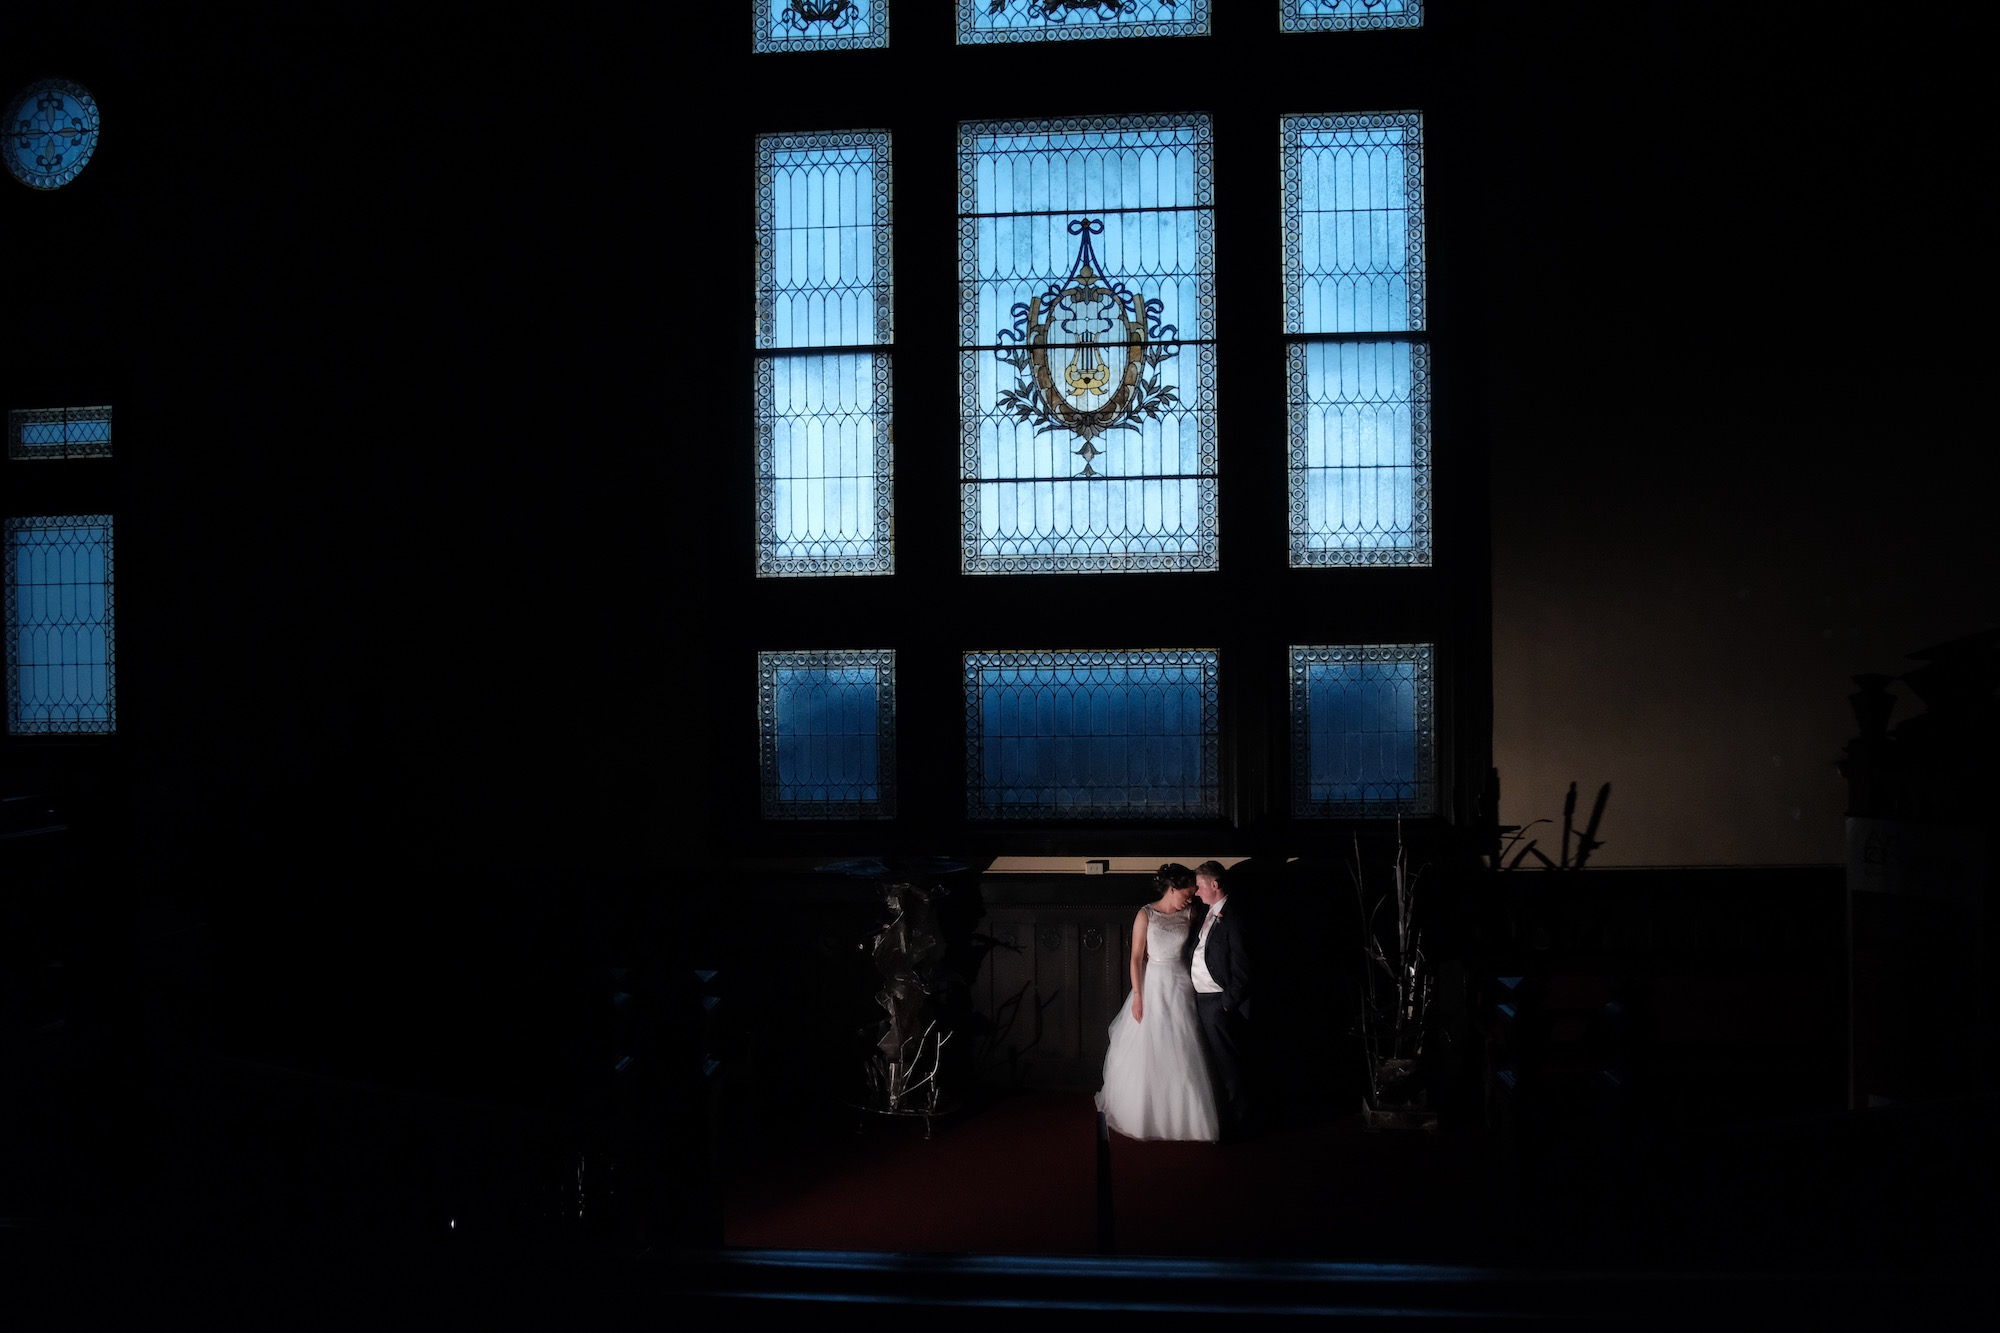 rathskeller-indianapolis-wedding-portrait